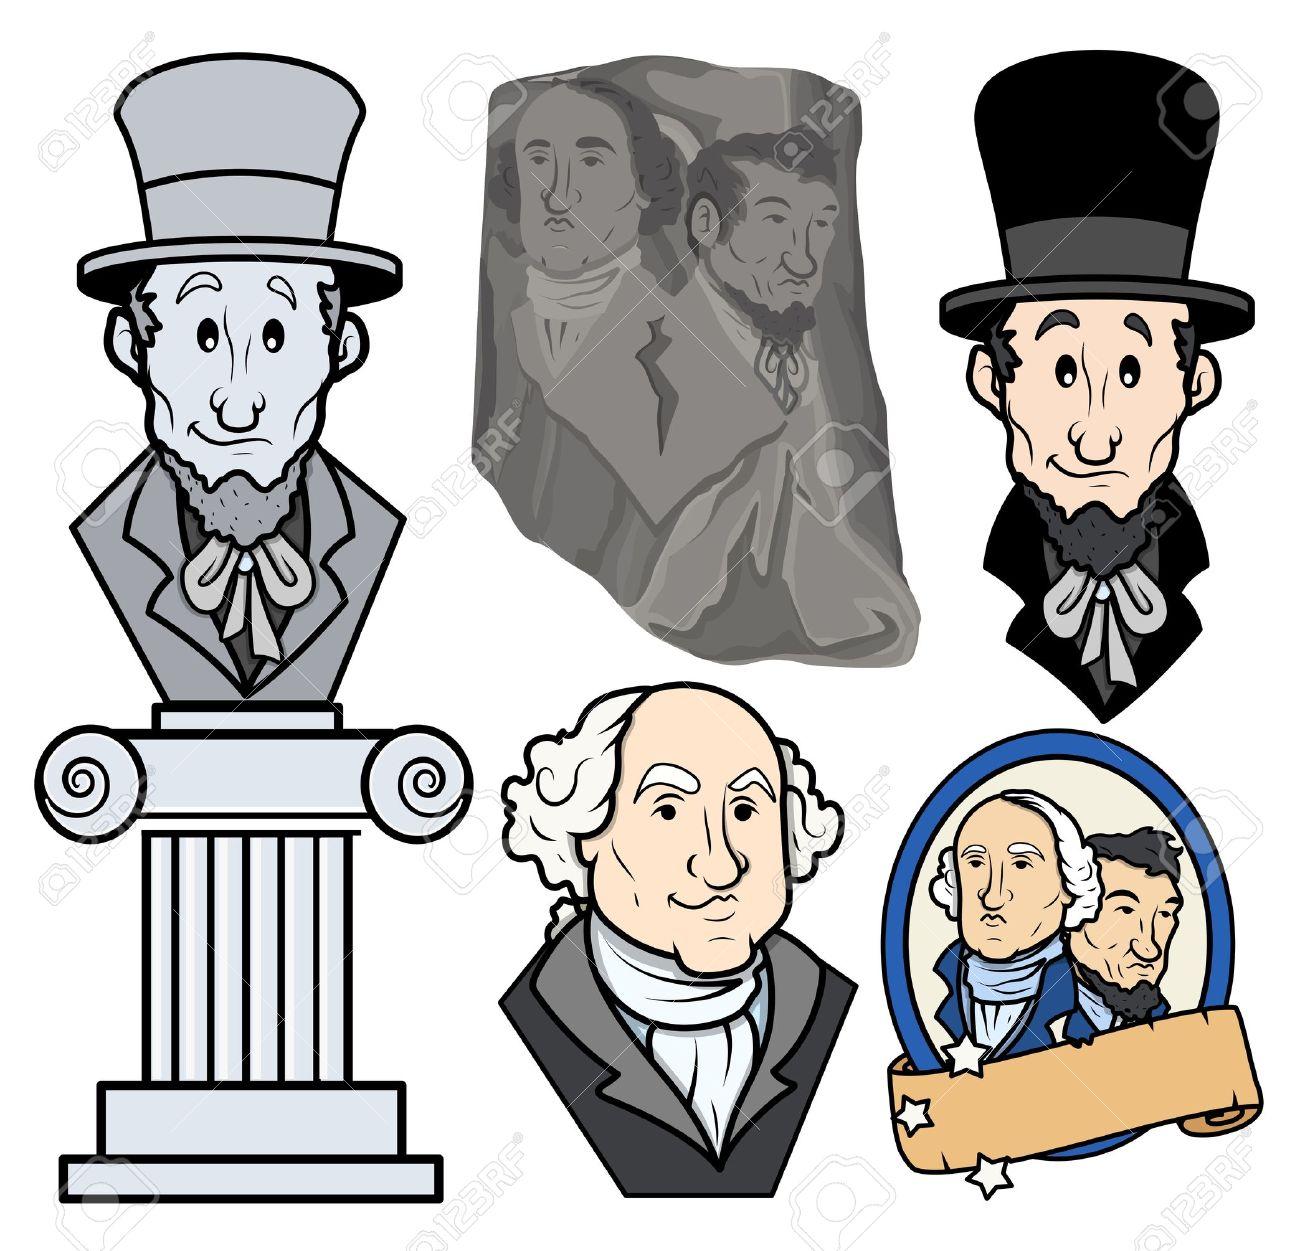 Washington clipart #5, Download drawings